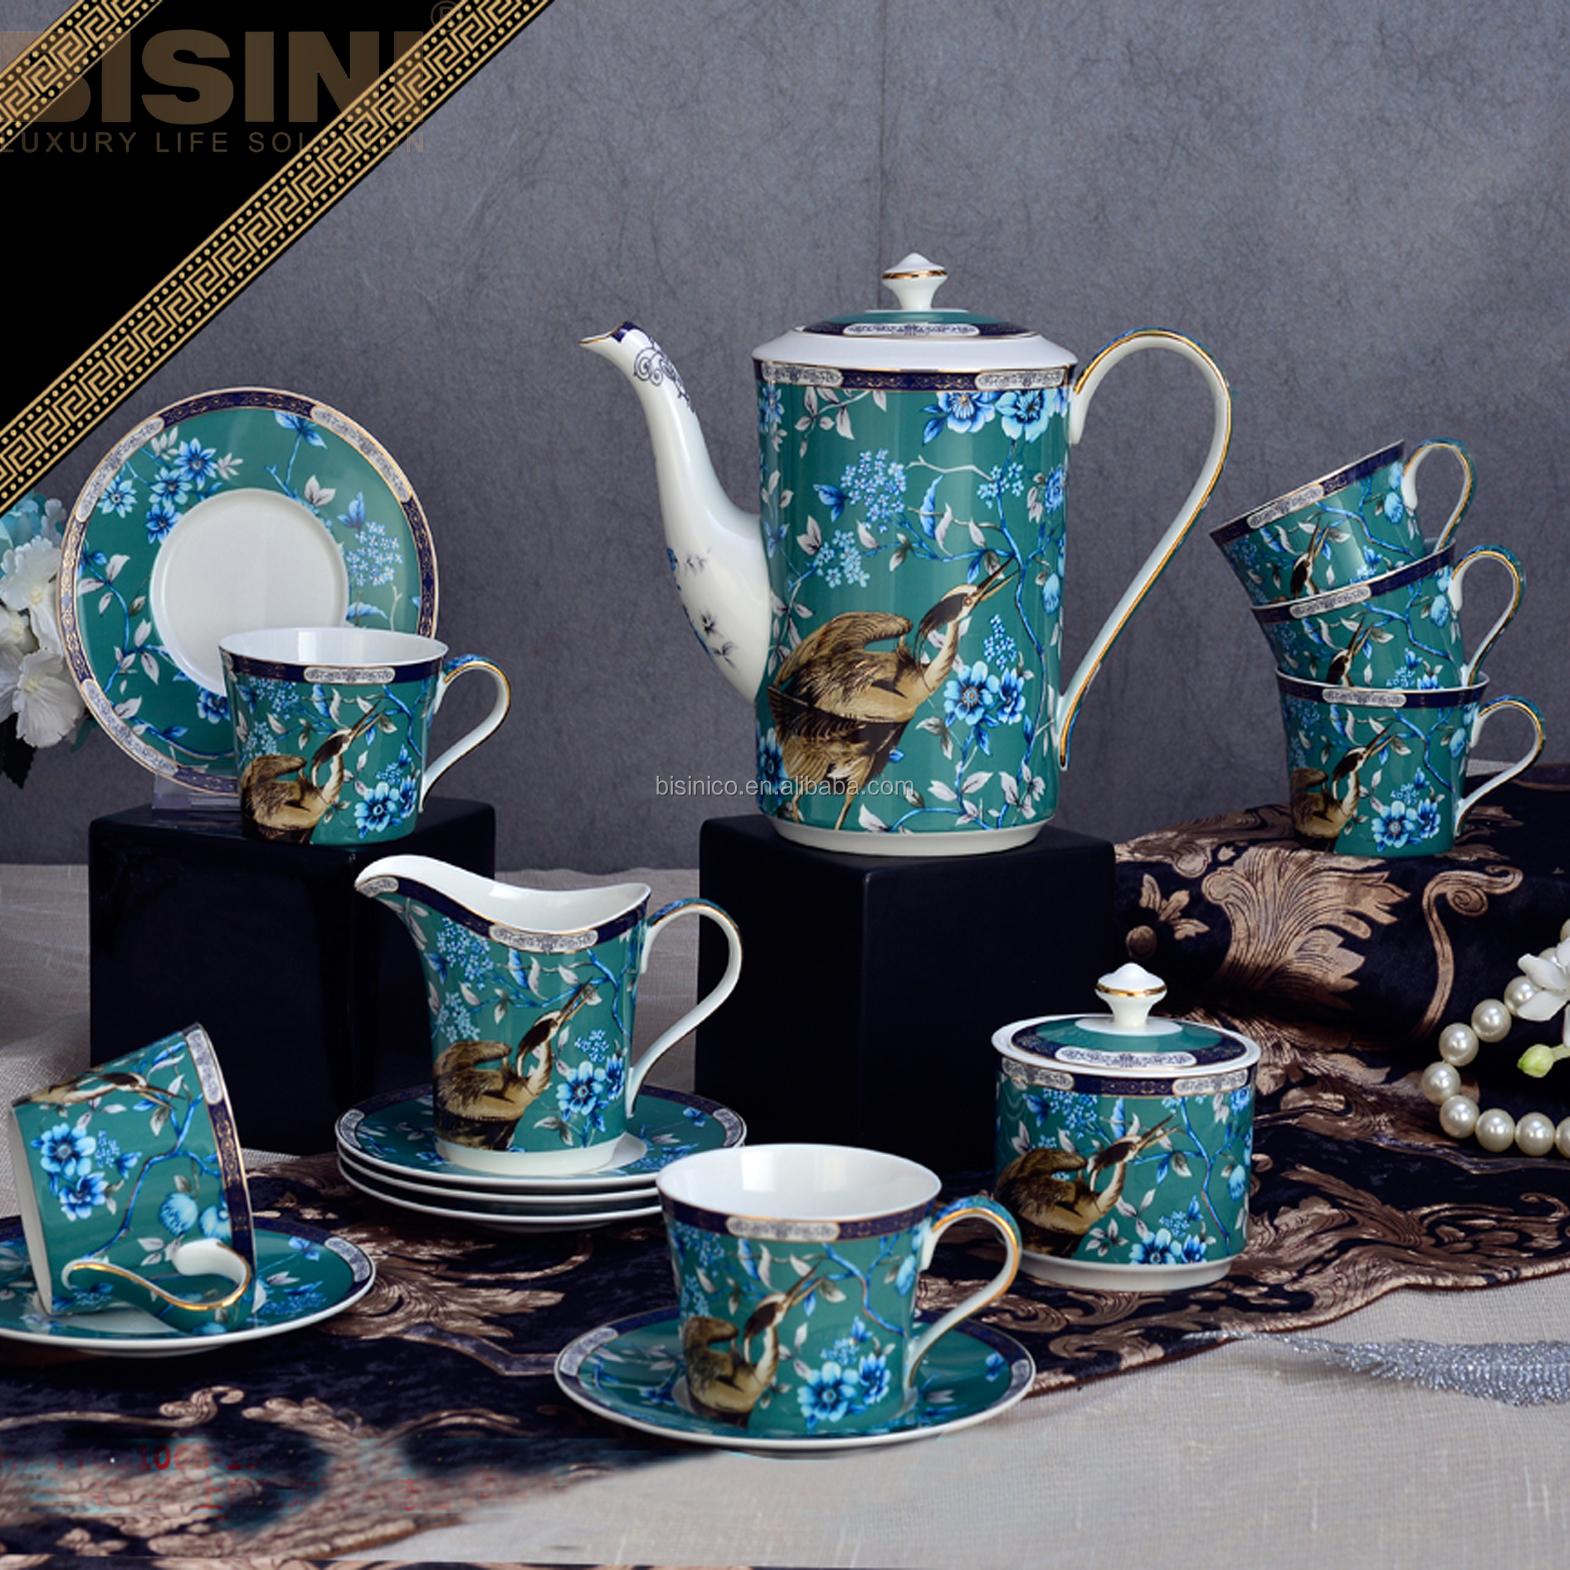 Porcelain Tea Sets Vintage Ceramic Colored Glaze Drinkware With Birds And Flowers Porcelain Tea Cup Set For Home And Office Use Buy Tea Cups Fine Porcelain Bone China Tea Set Ceramic Large Tea